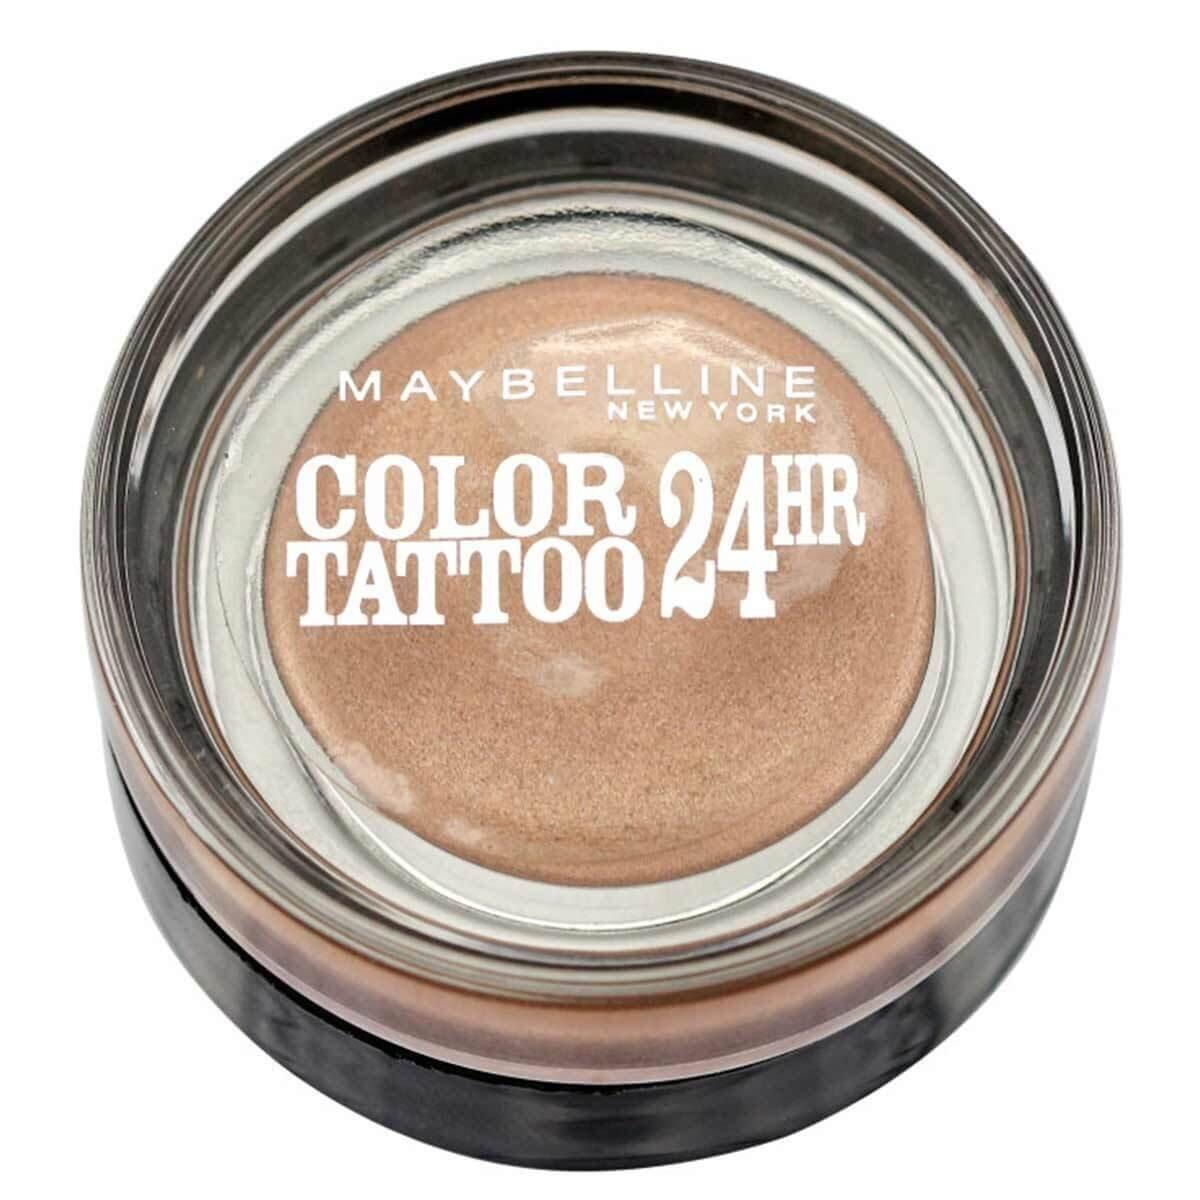 Color Tattoo 24H Göz Farı 35 On And On Bronze